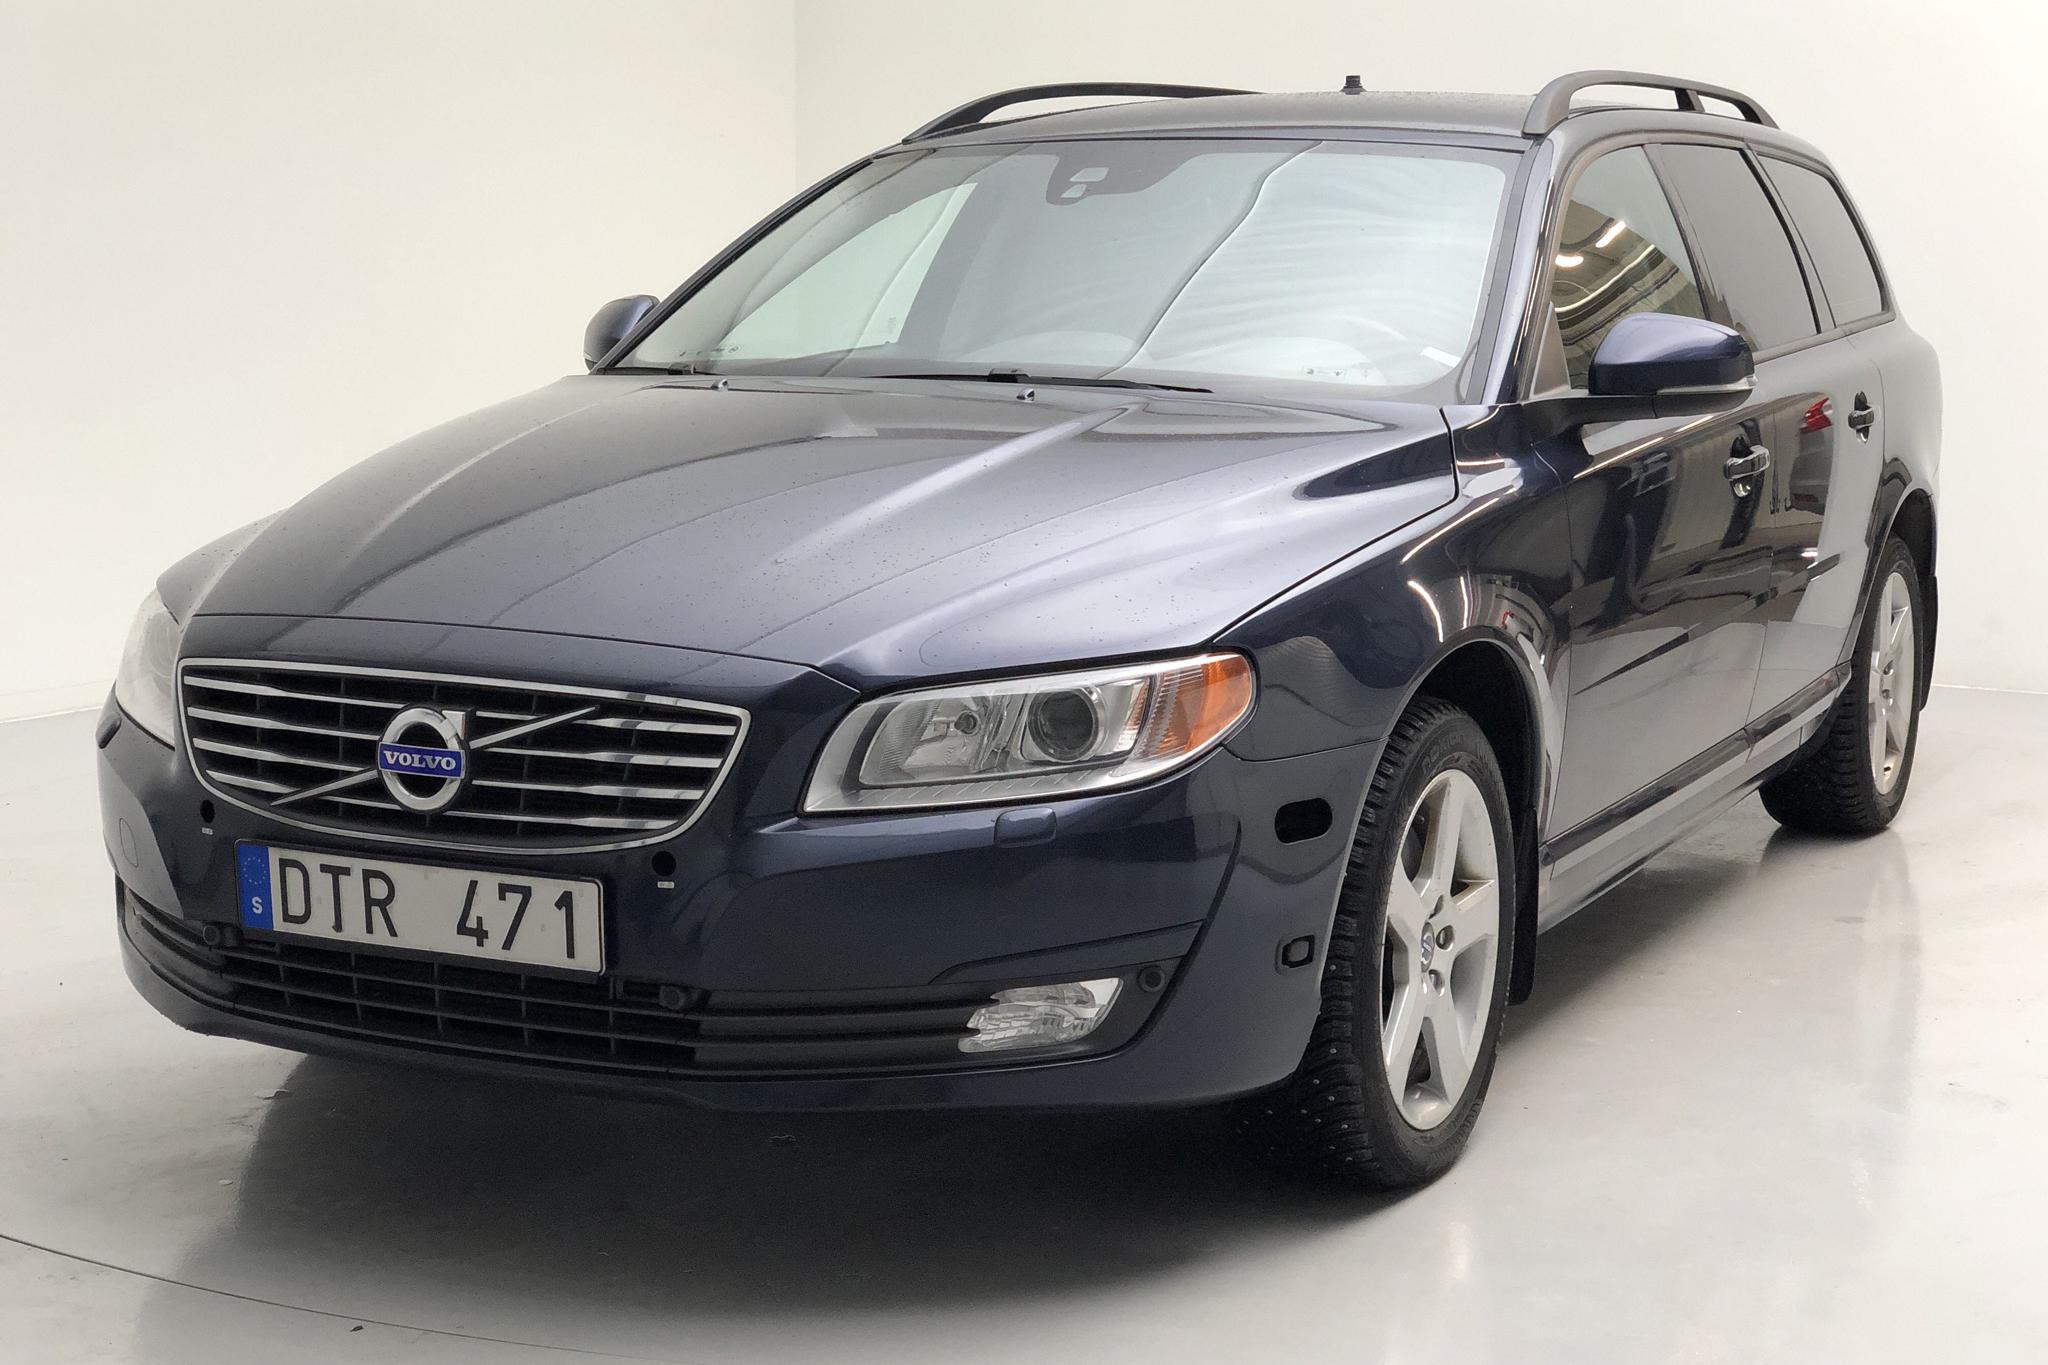 Volvo V70 II T4F (180hk) - 98 590 km - Automatic - Dark Blue - 2014